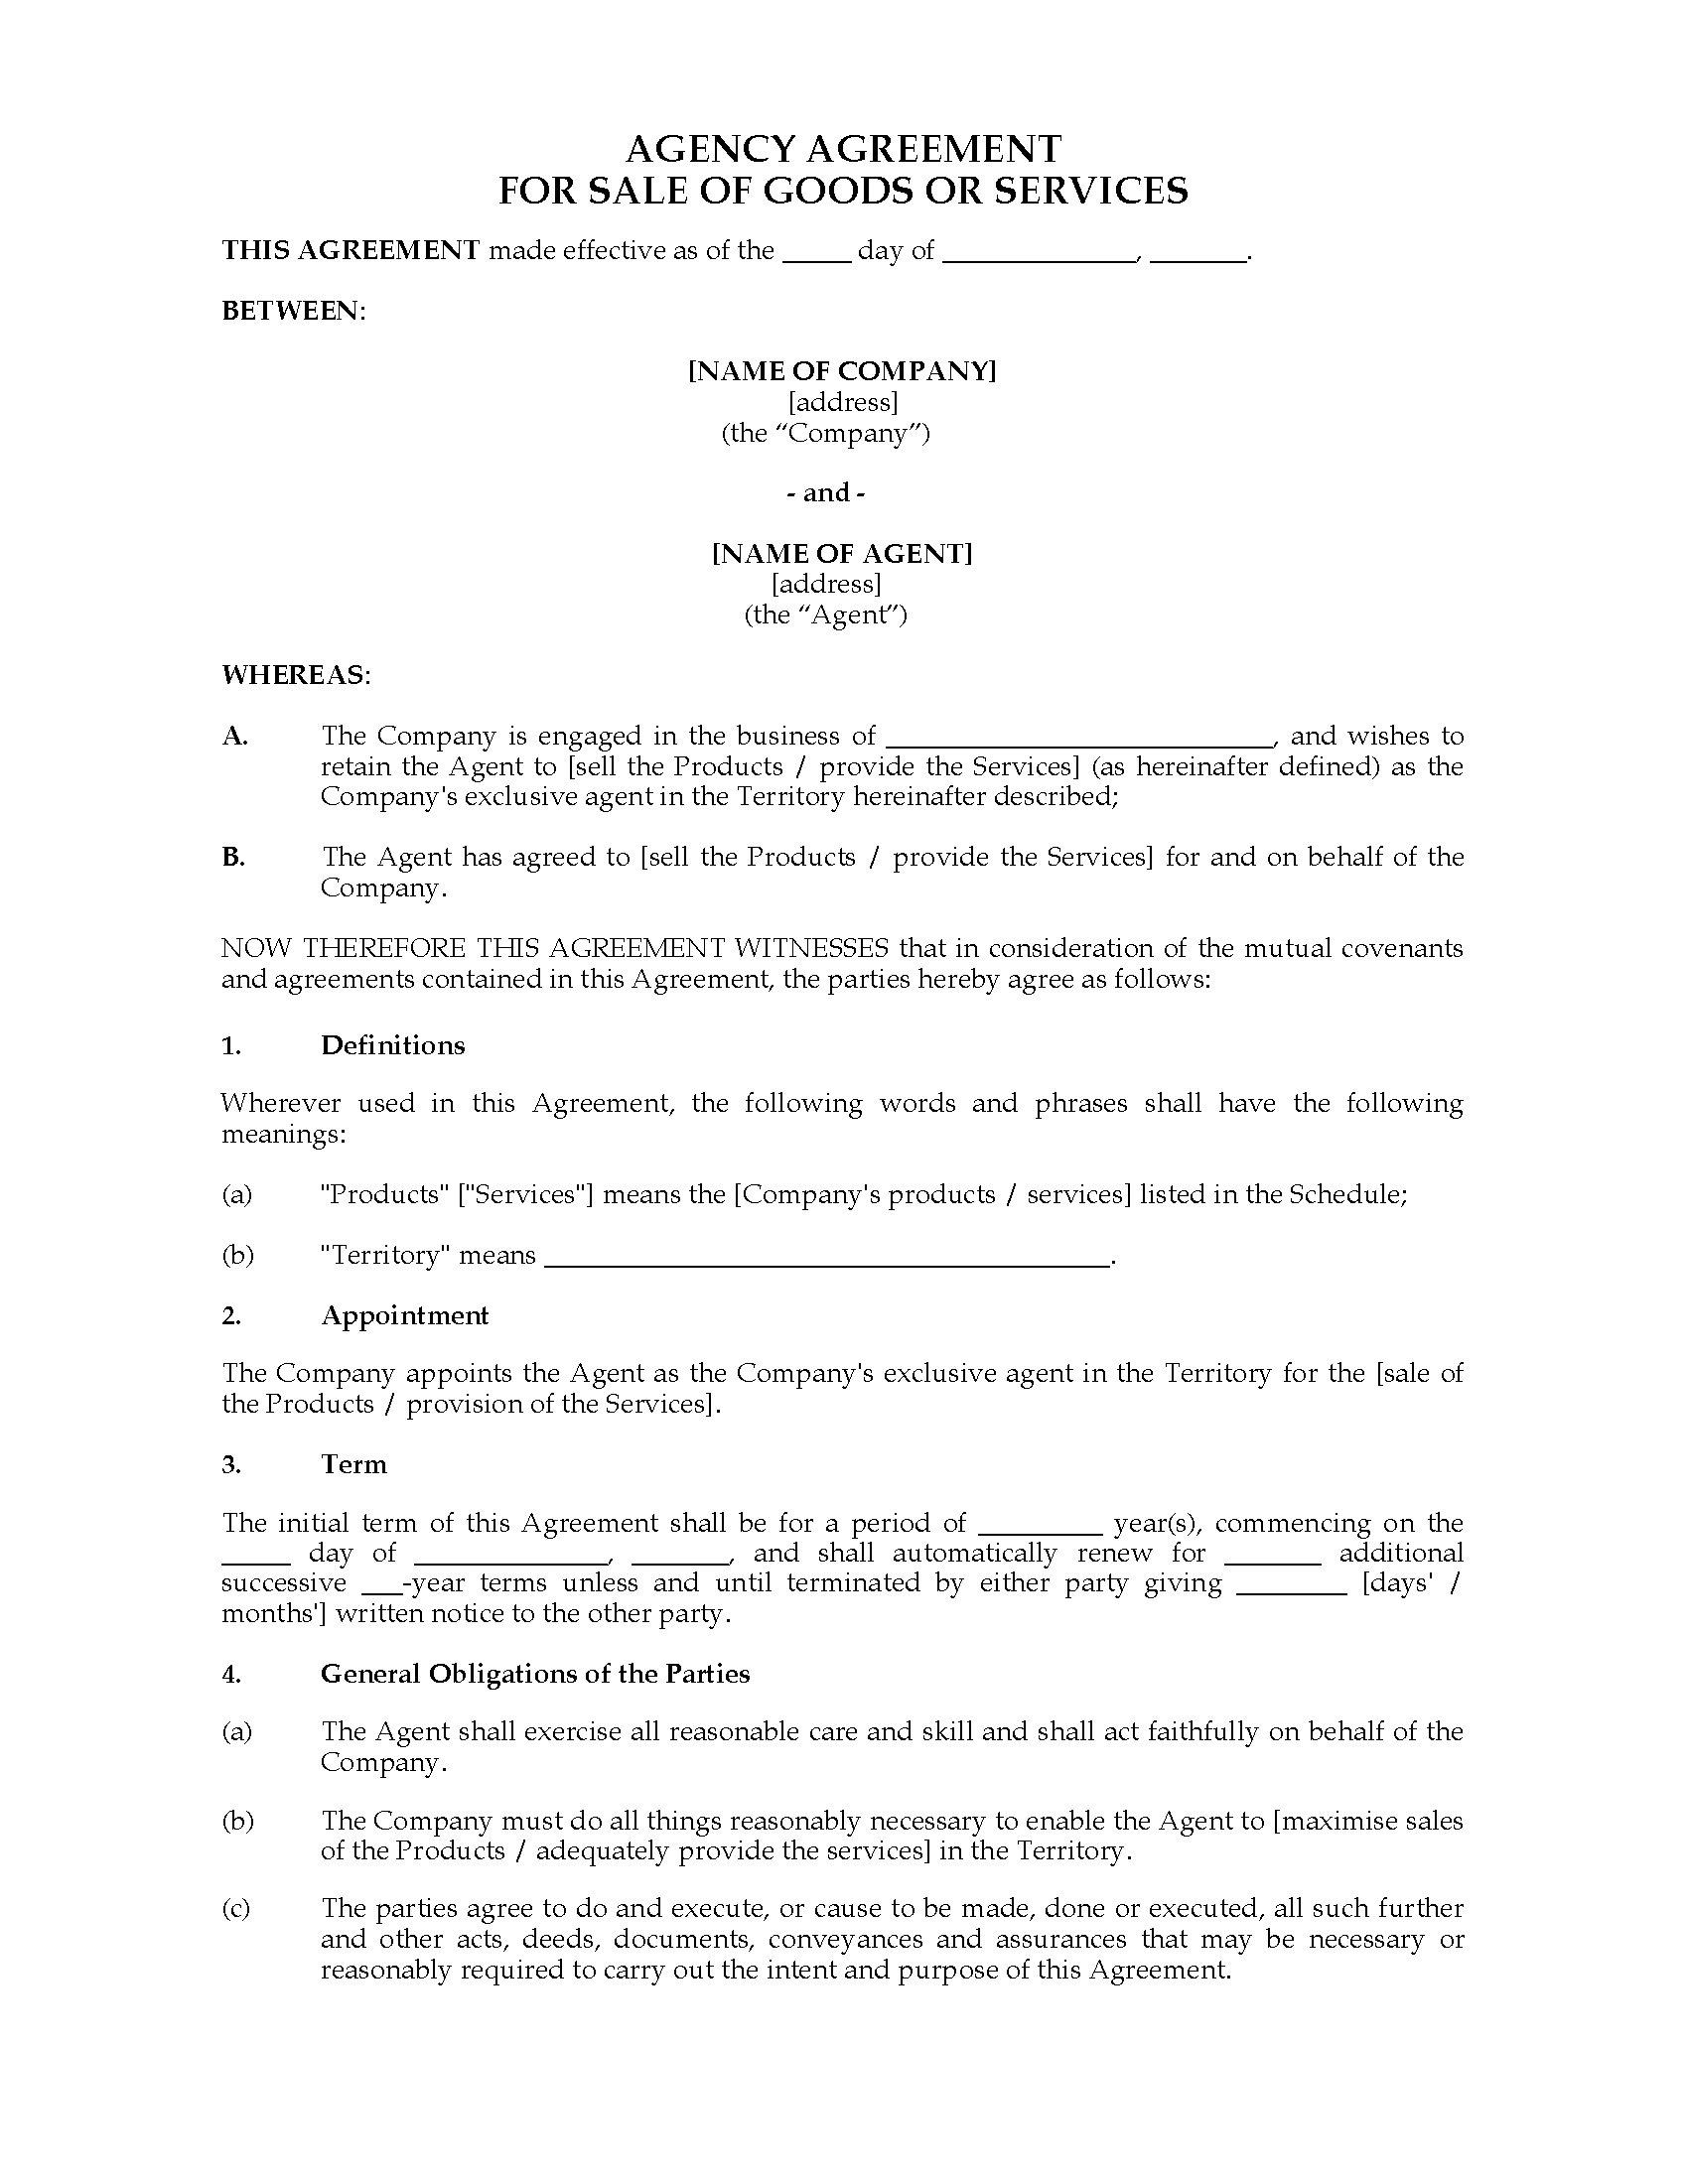 003 Magnificent Sale Agreement Template Australia Idea  Busines Horse Car ContractFull